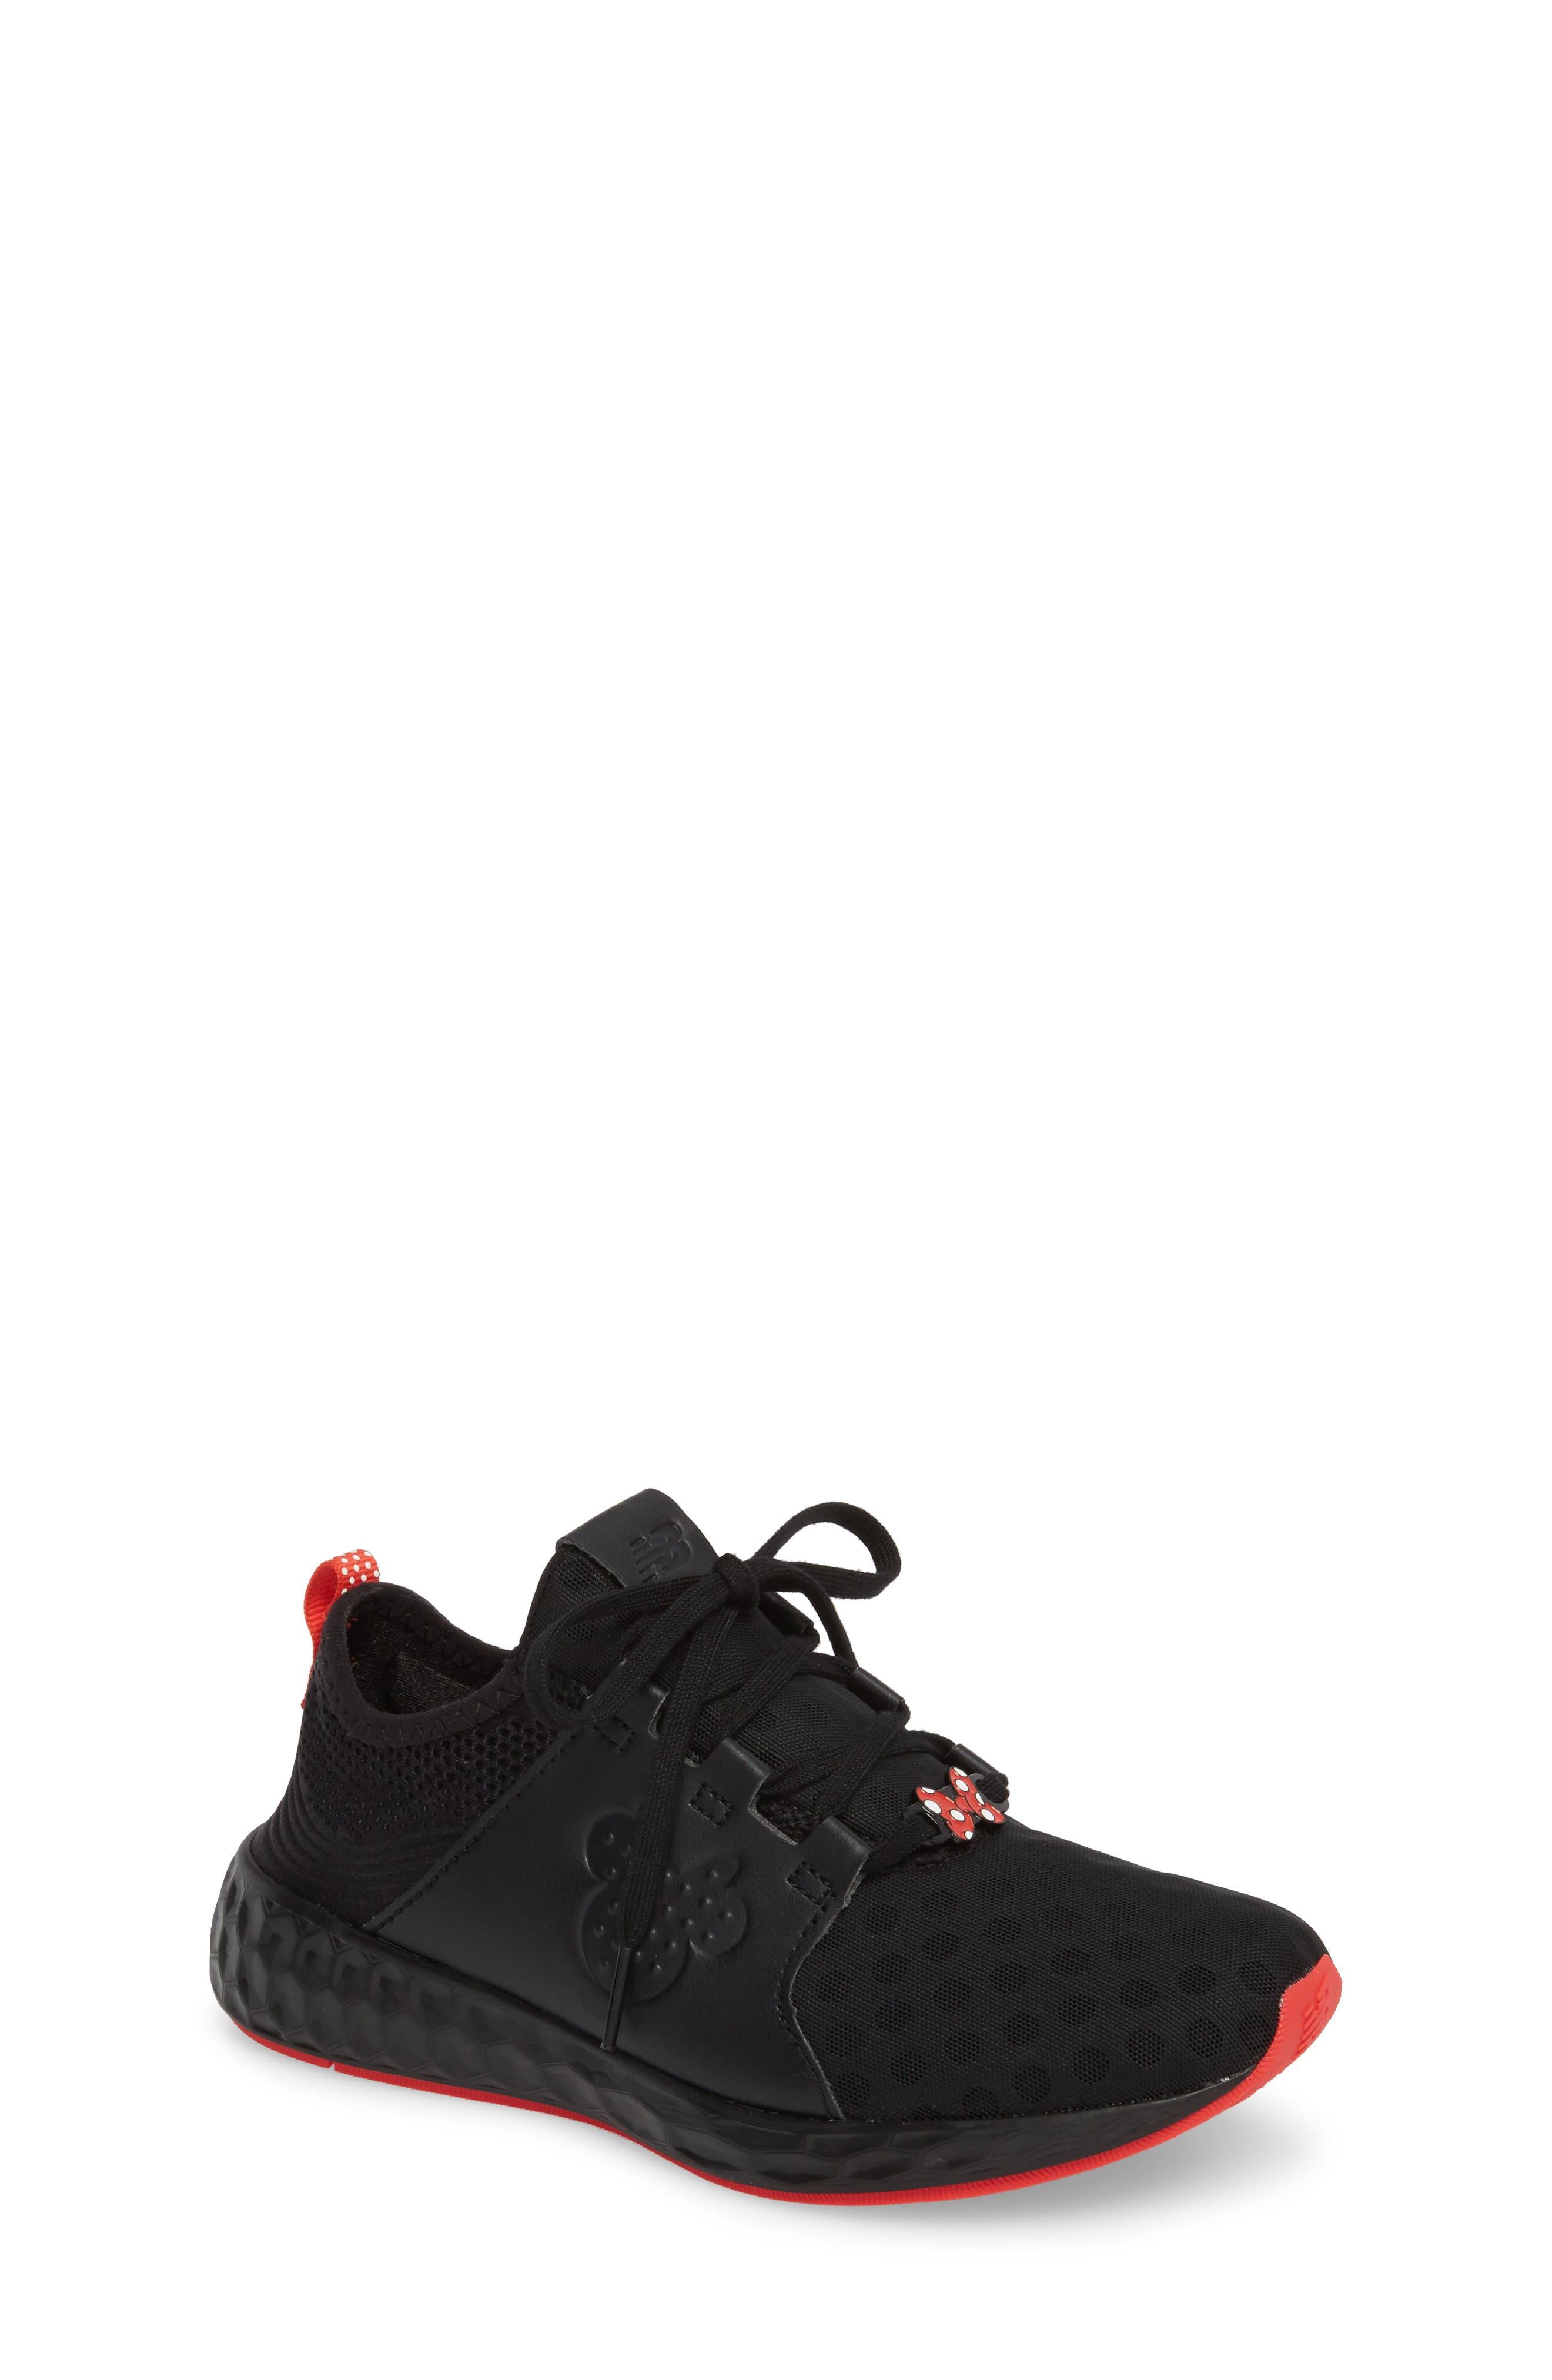 x Disney Minnie Mouse Cruz Sport Sneaker,                         Main,                         color, Black/ Red